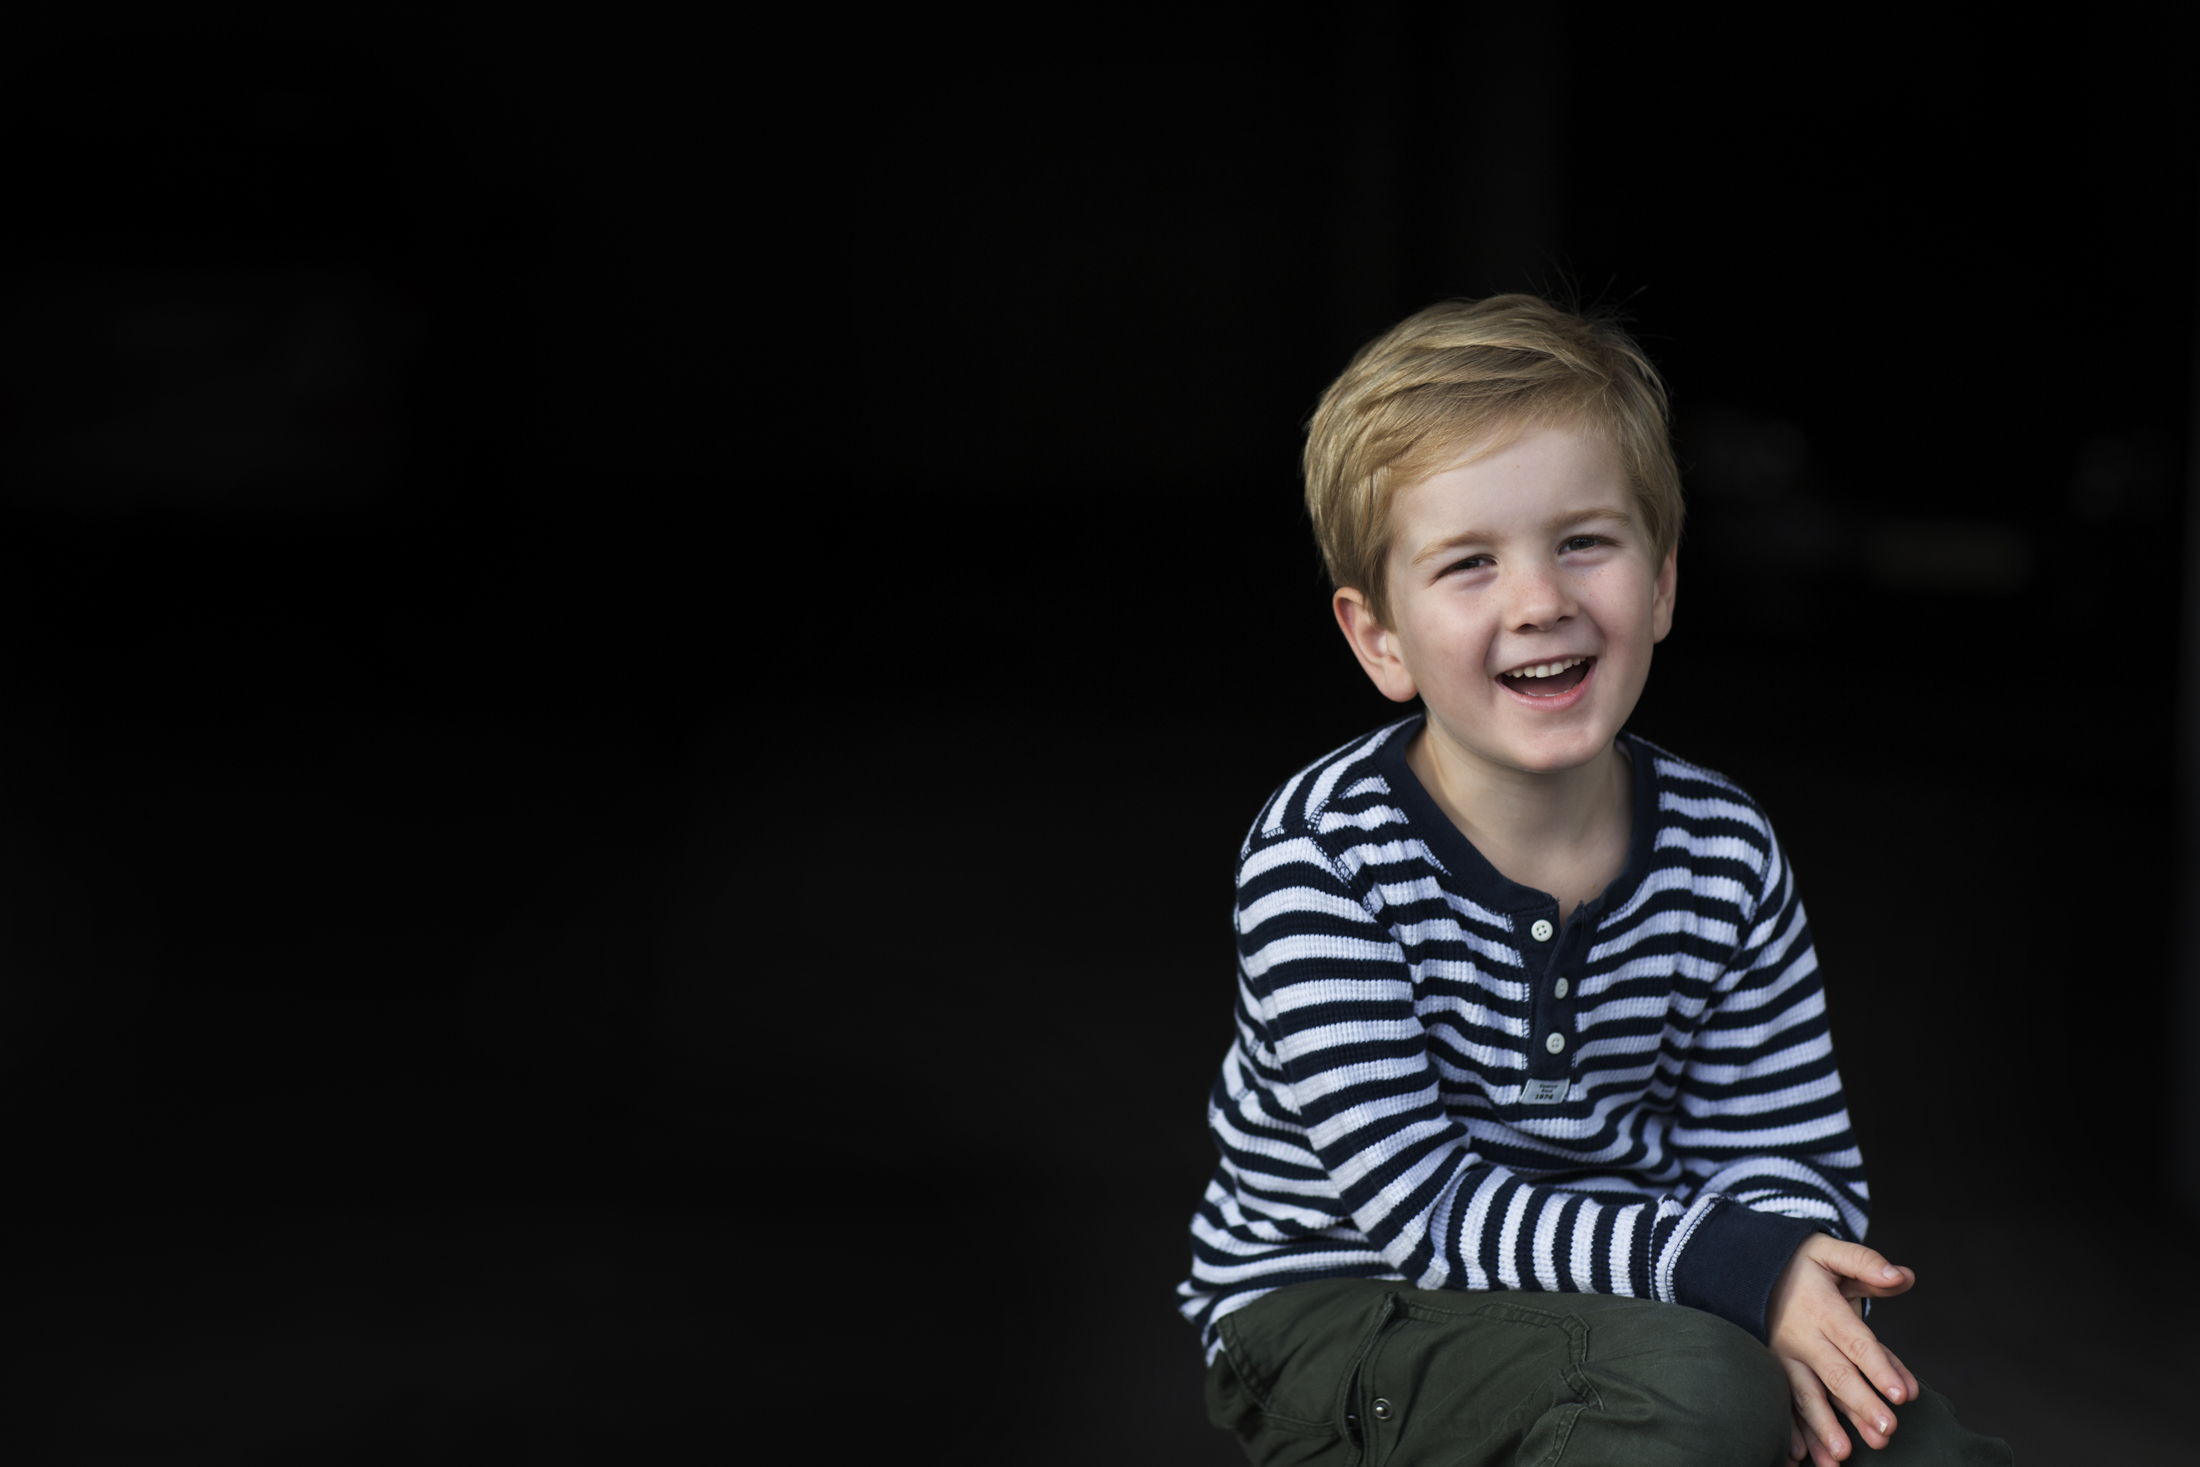 mark_taylor_sydney_family_photography_morffew-19.jpg